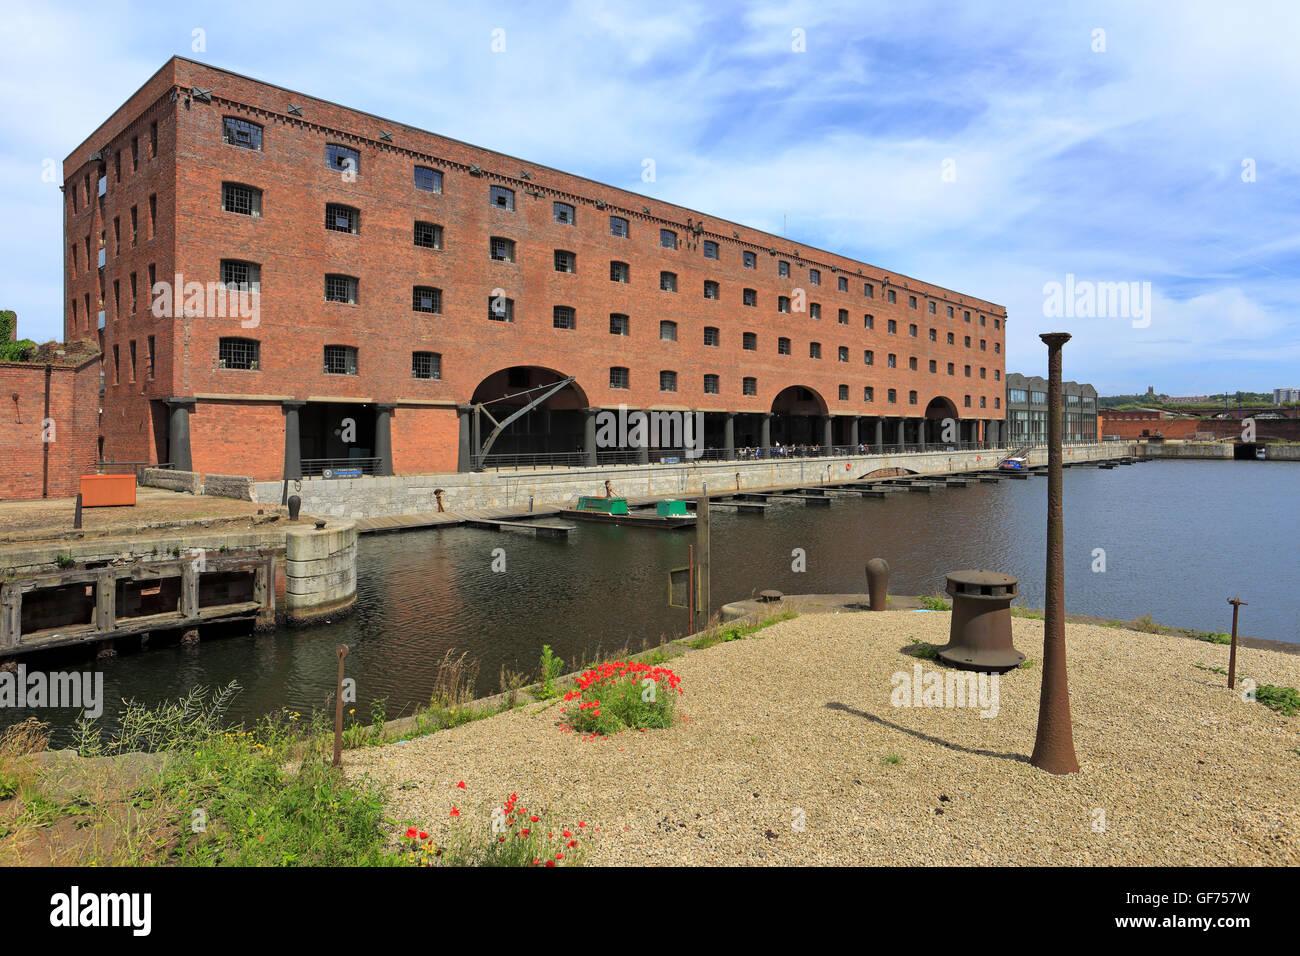 Titanic Hotel former Rum Warehouse, Stanley Dock, Liverpool, Merseyside, England, UK. Stock Photo